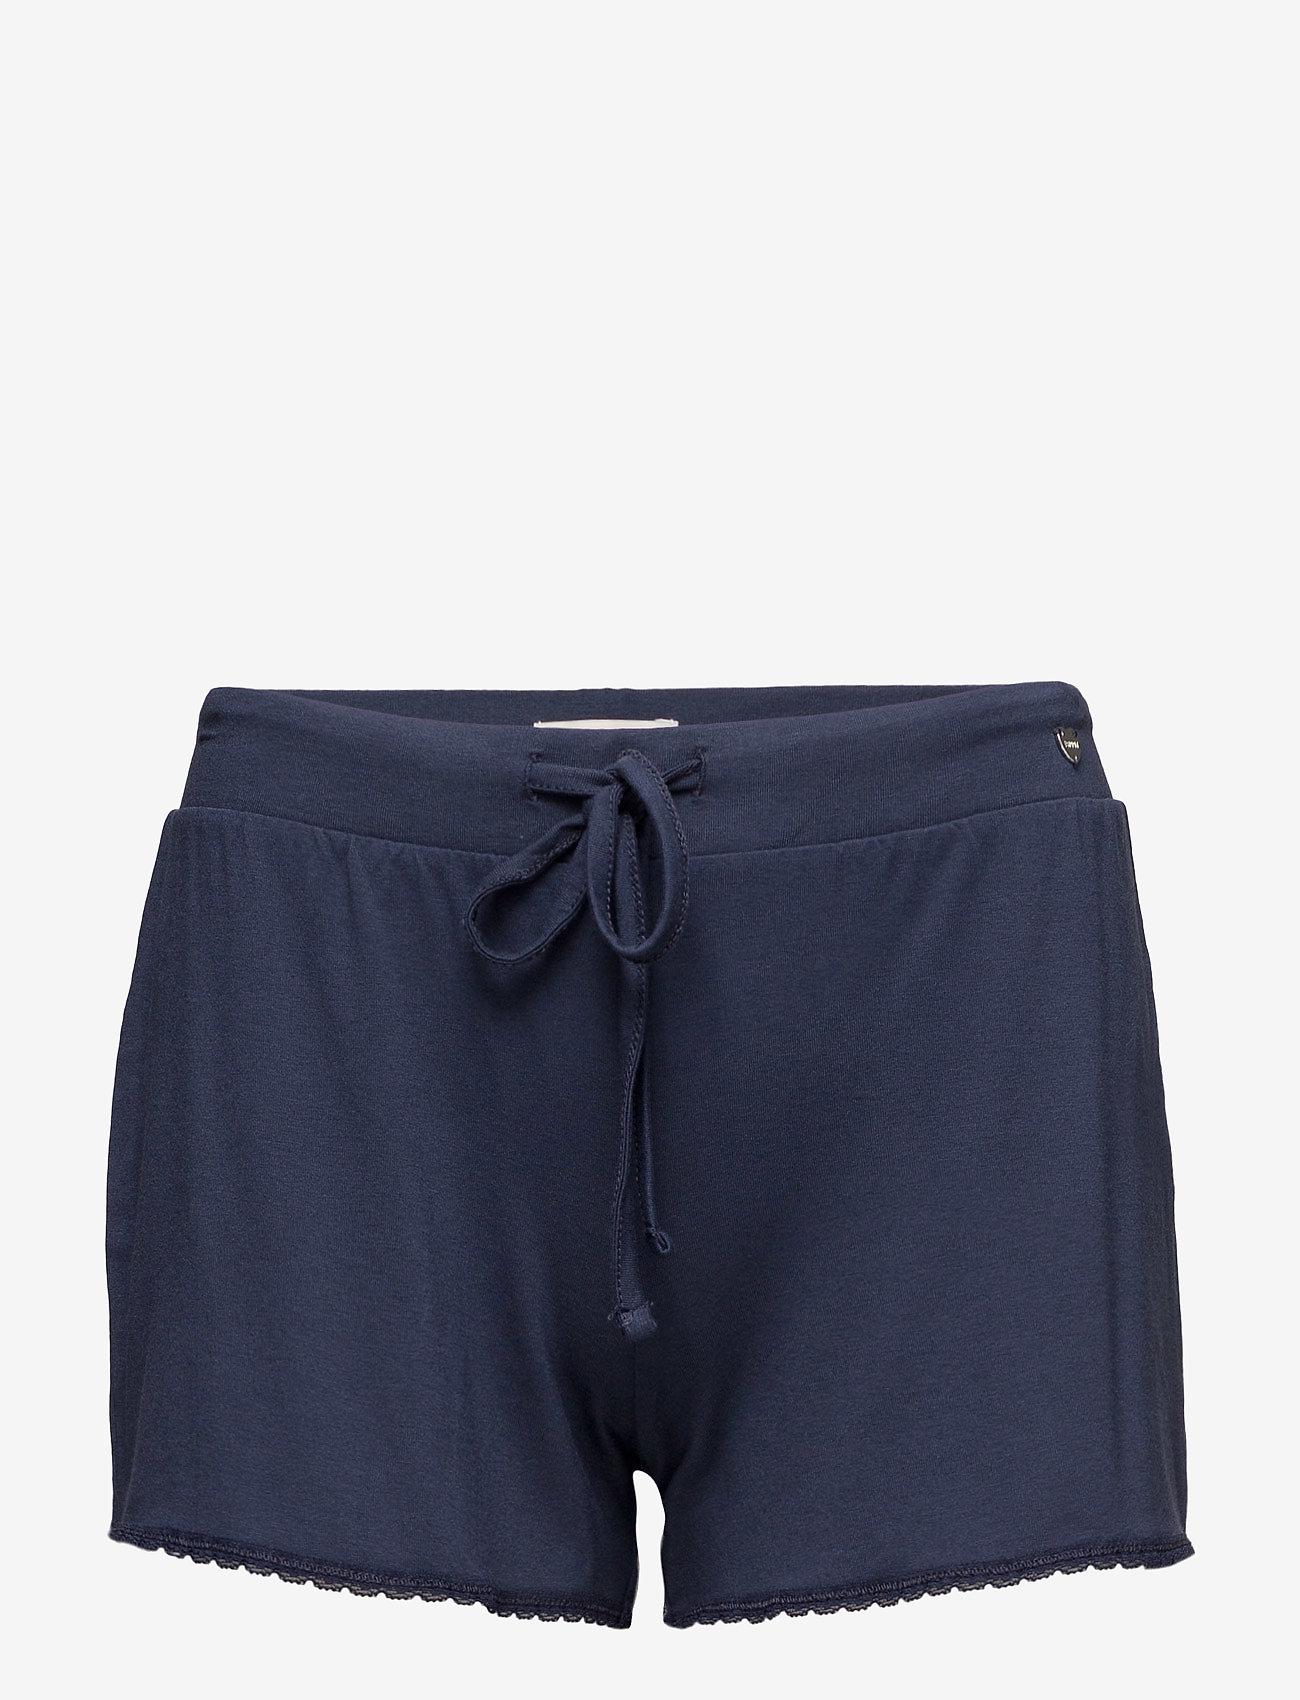 Esprit Bodywear Women - Nightpants - shorts - navy - 0